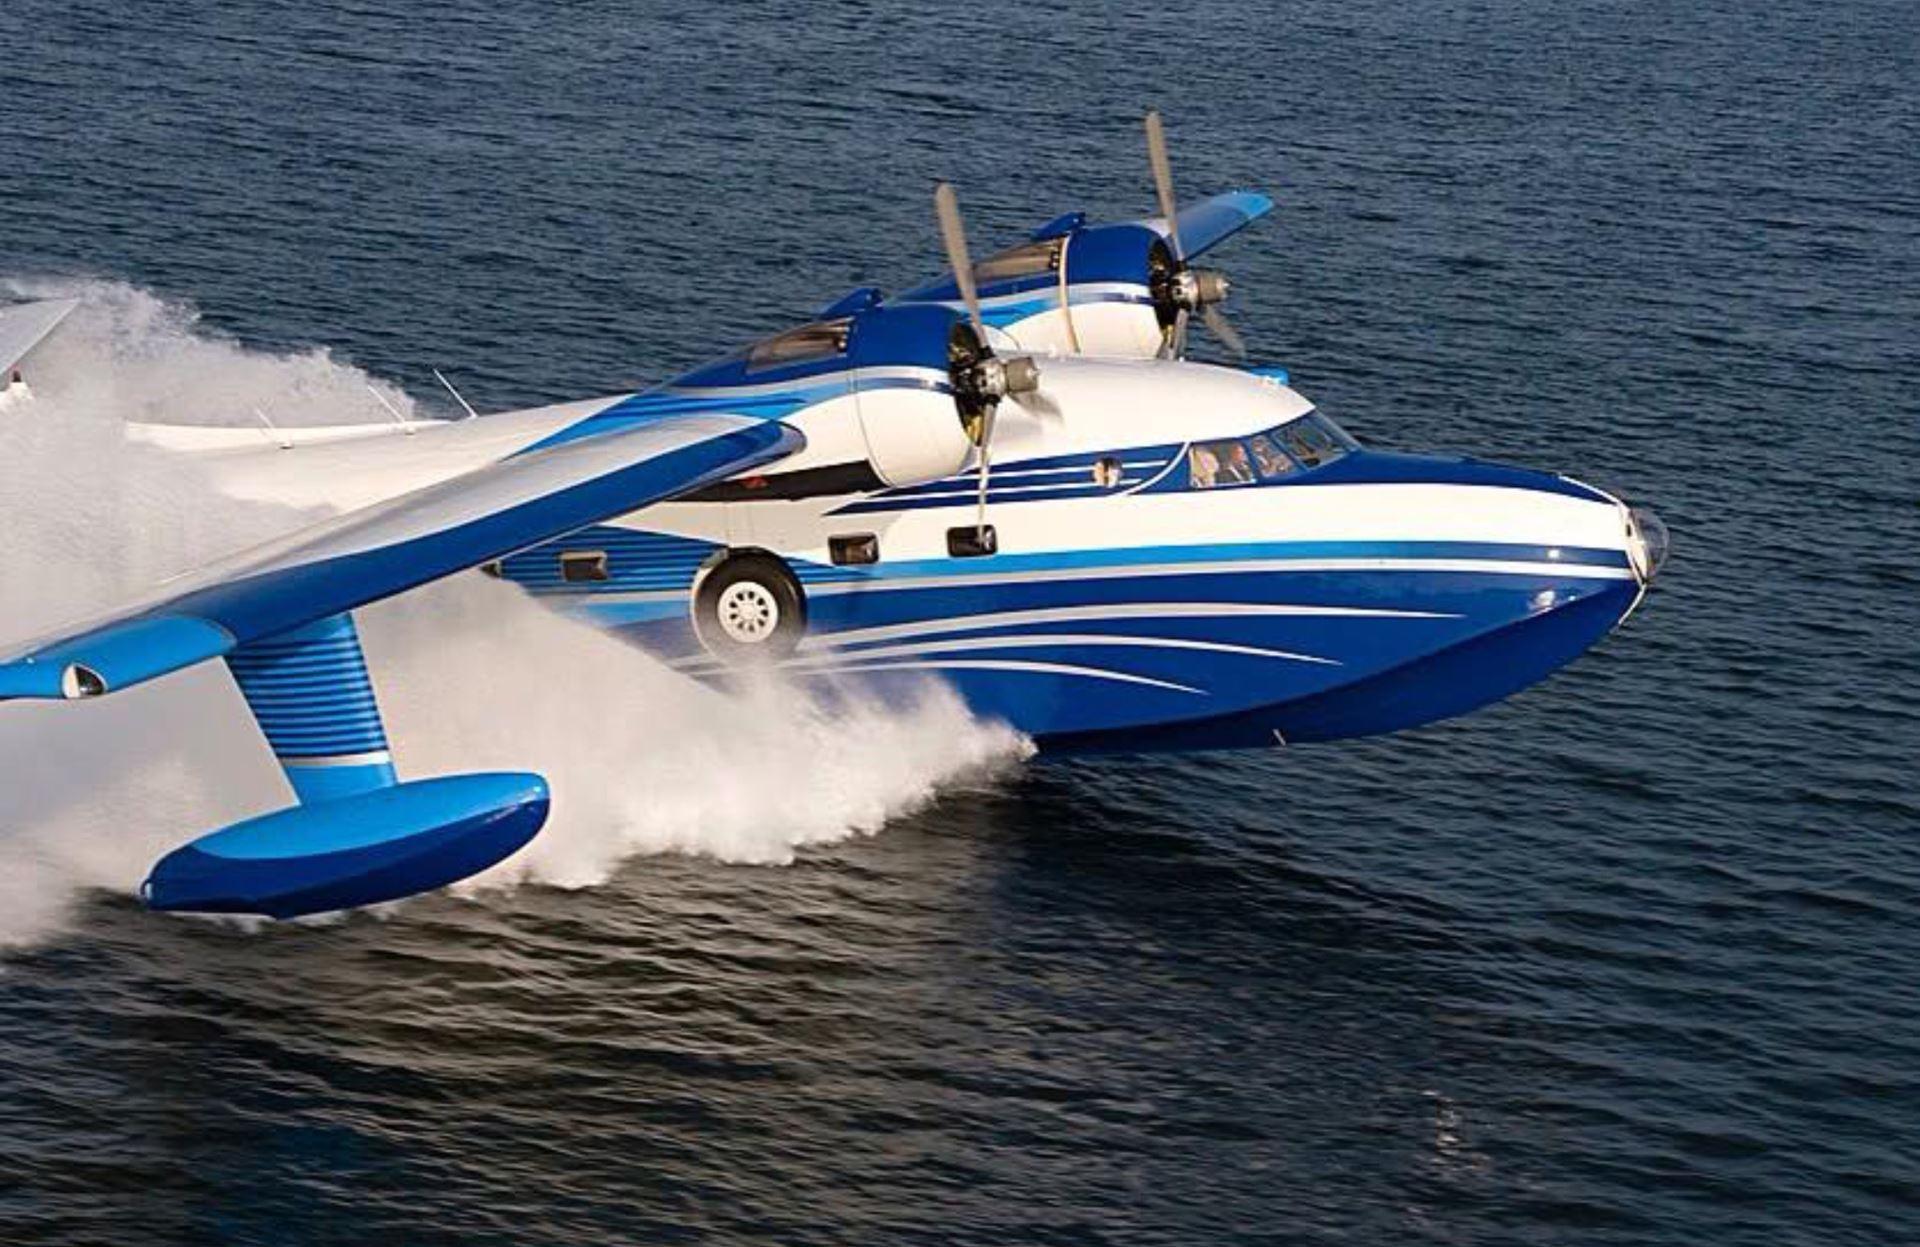 Seaplane Pilots Association Australia.